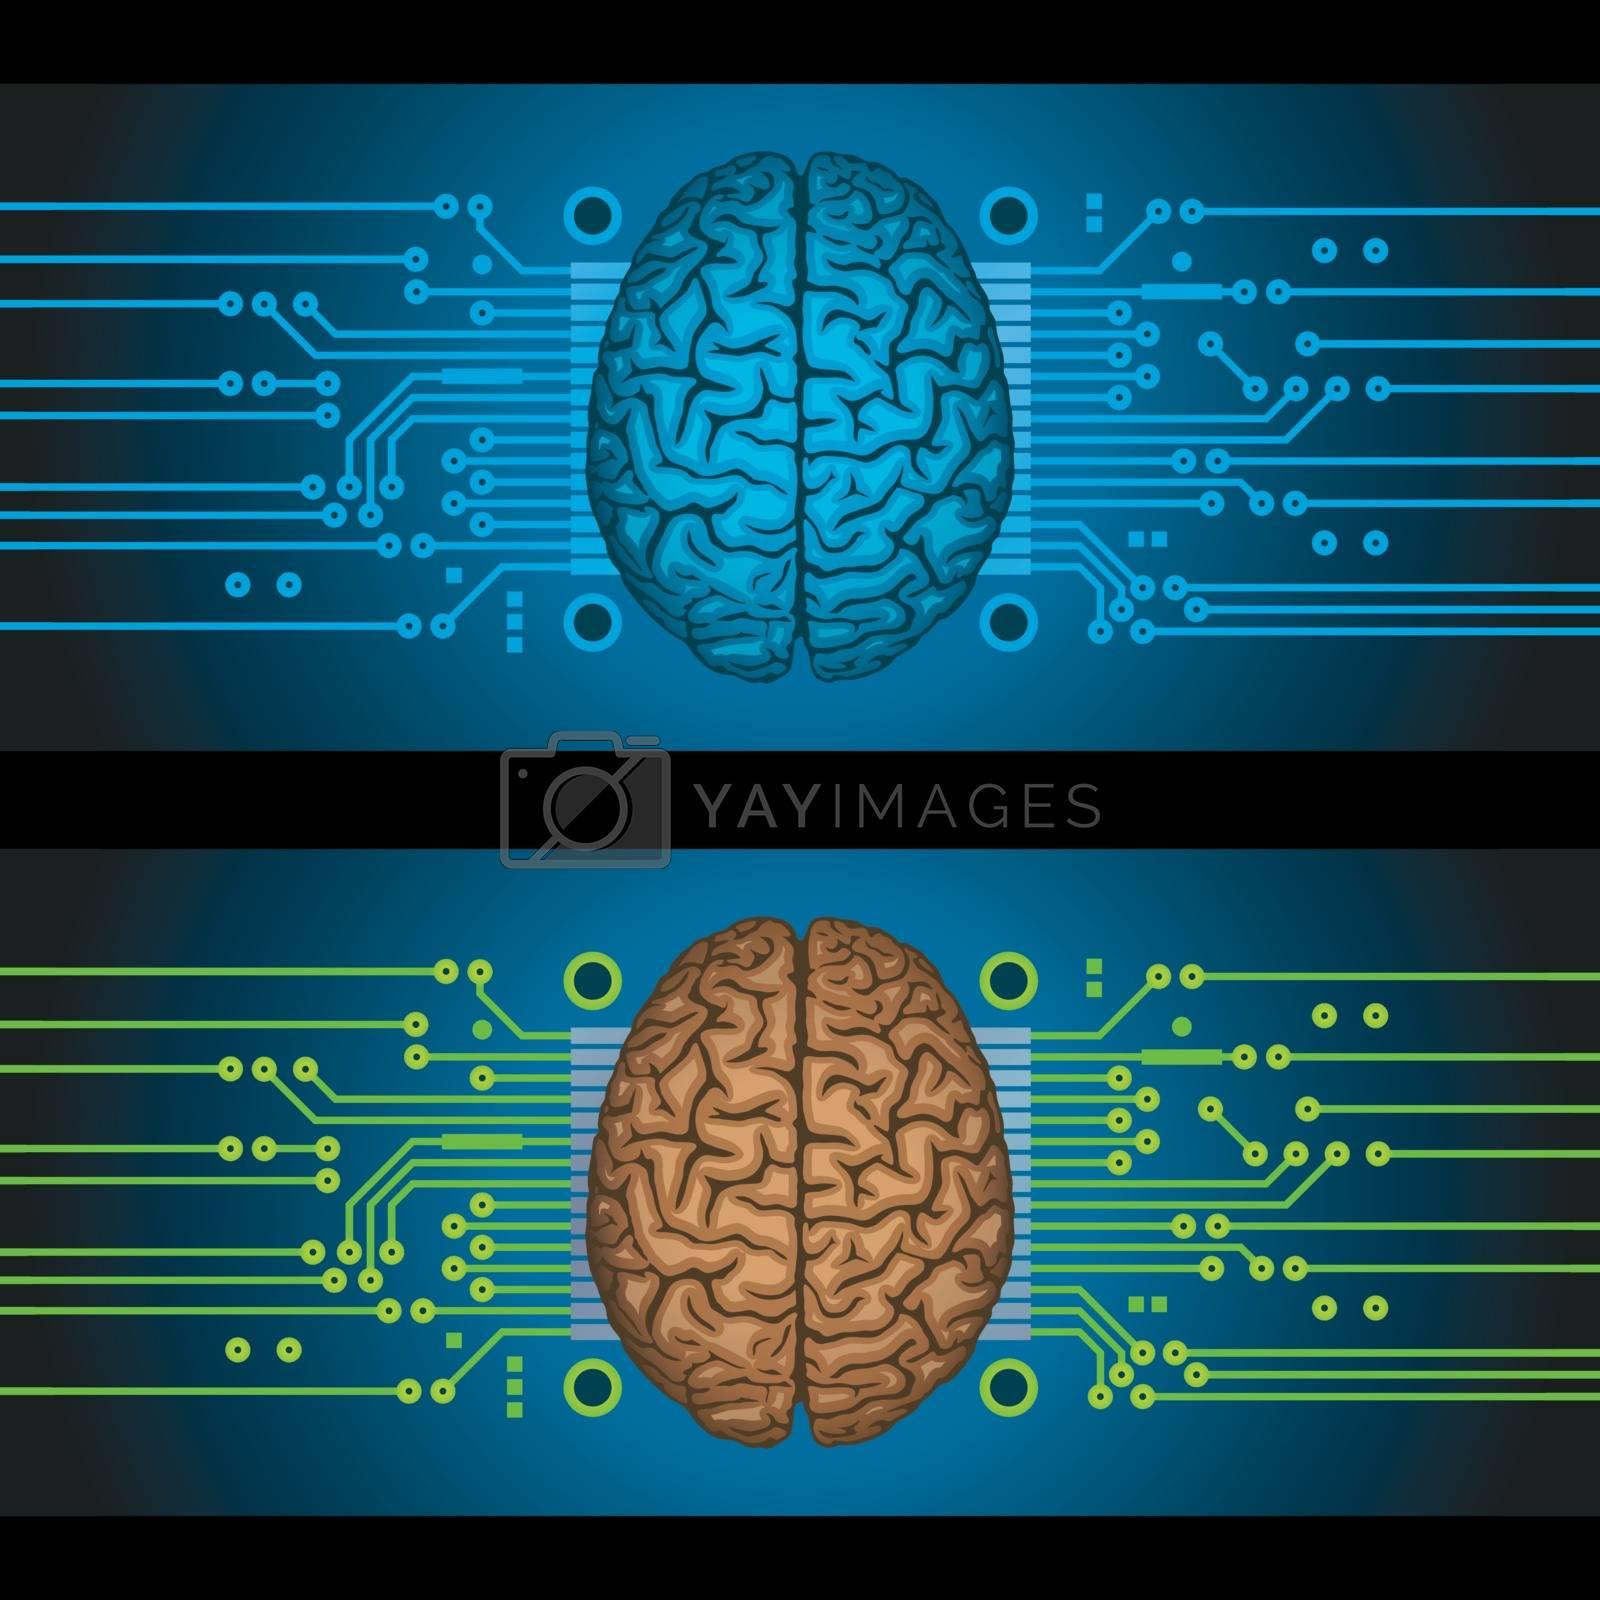 Vector illustration of the human brain.